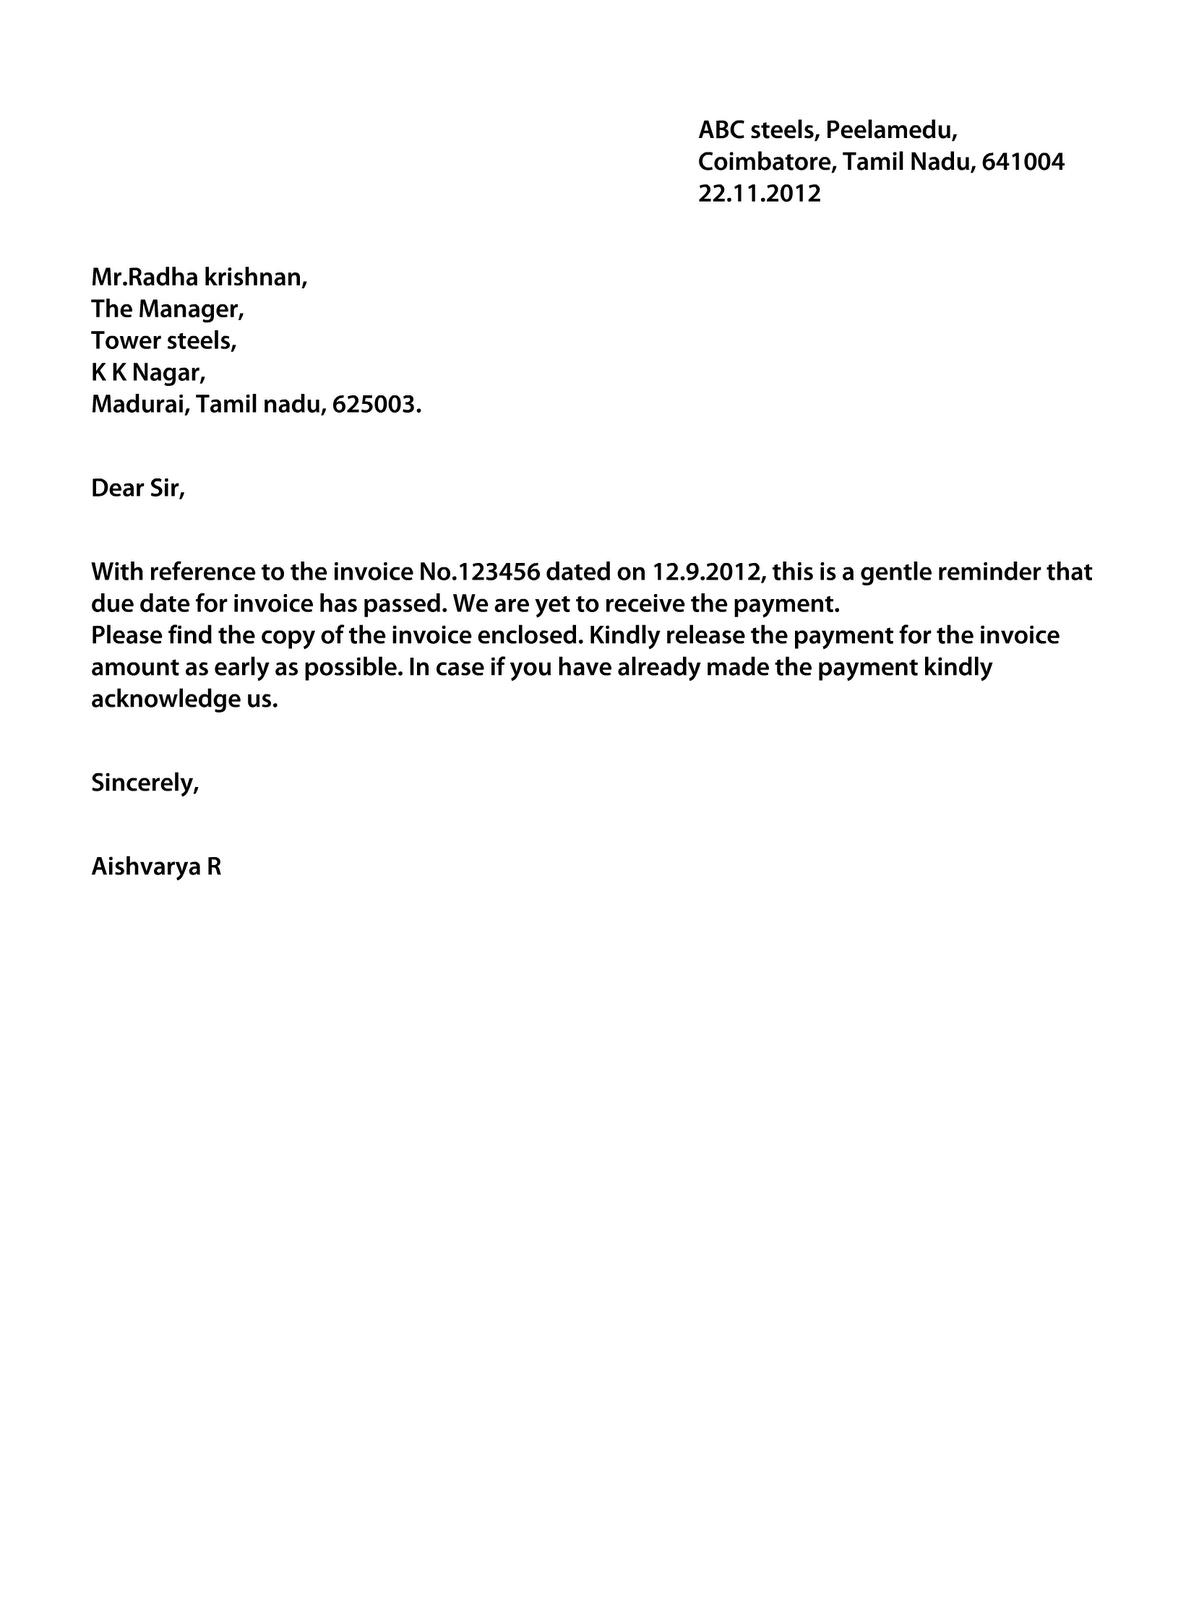 Dollar Price Letter Regarding Outstanding Payment